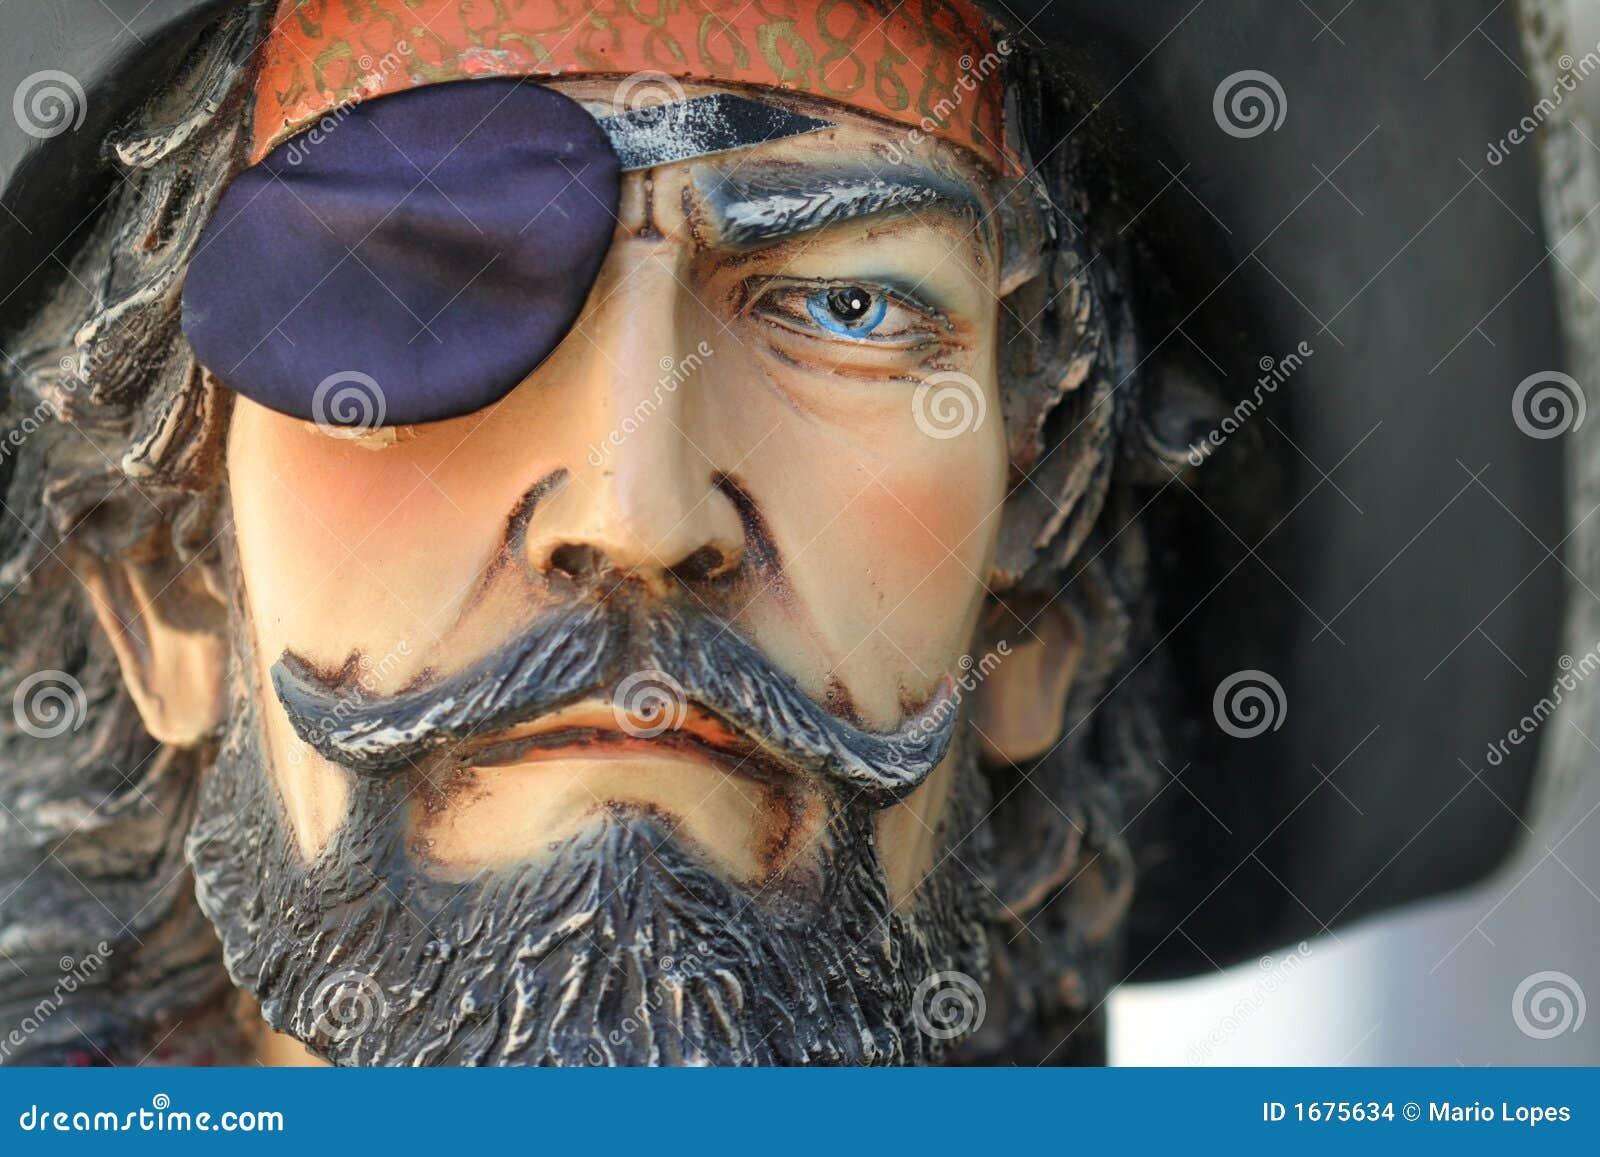 Portrait of a Pirate